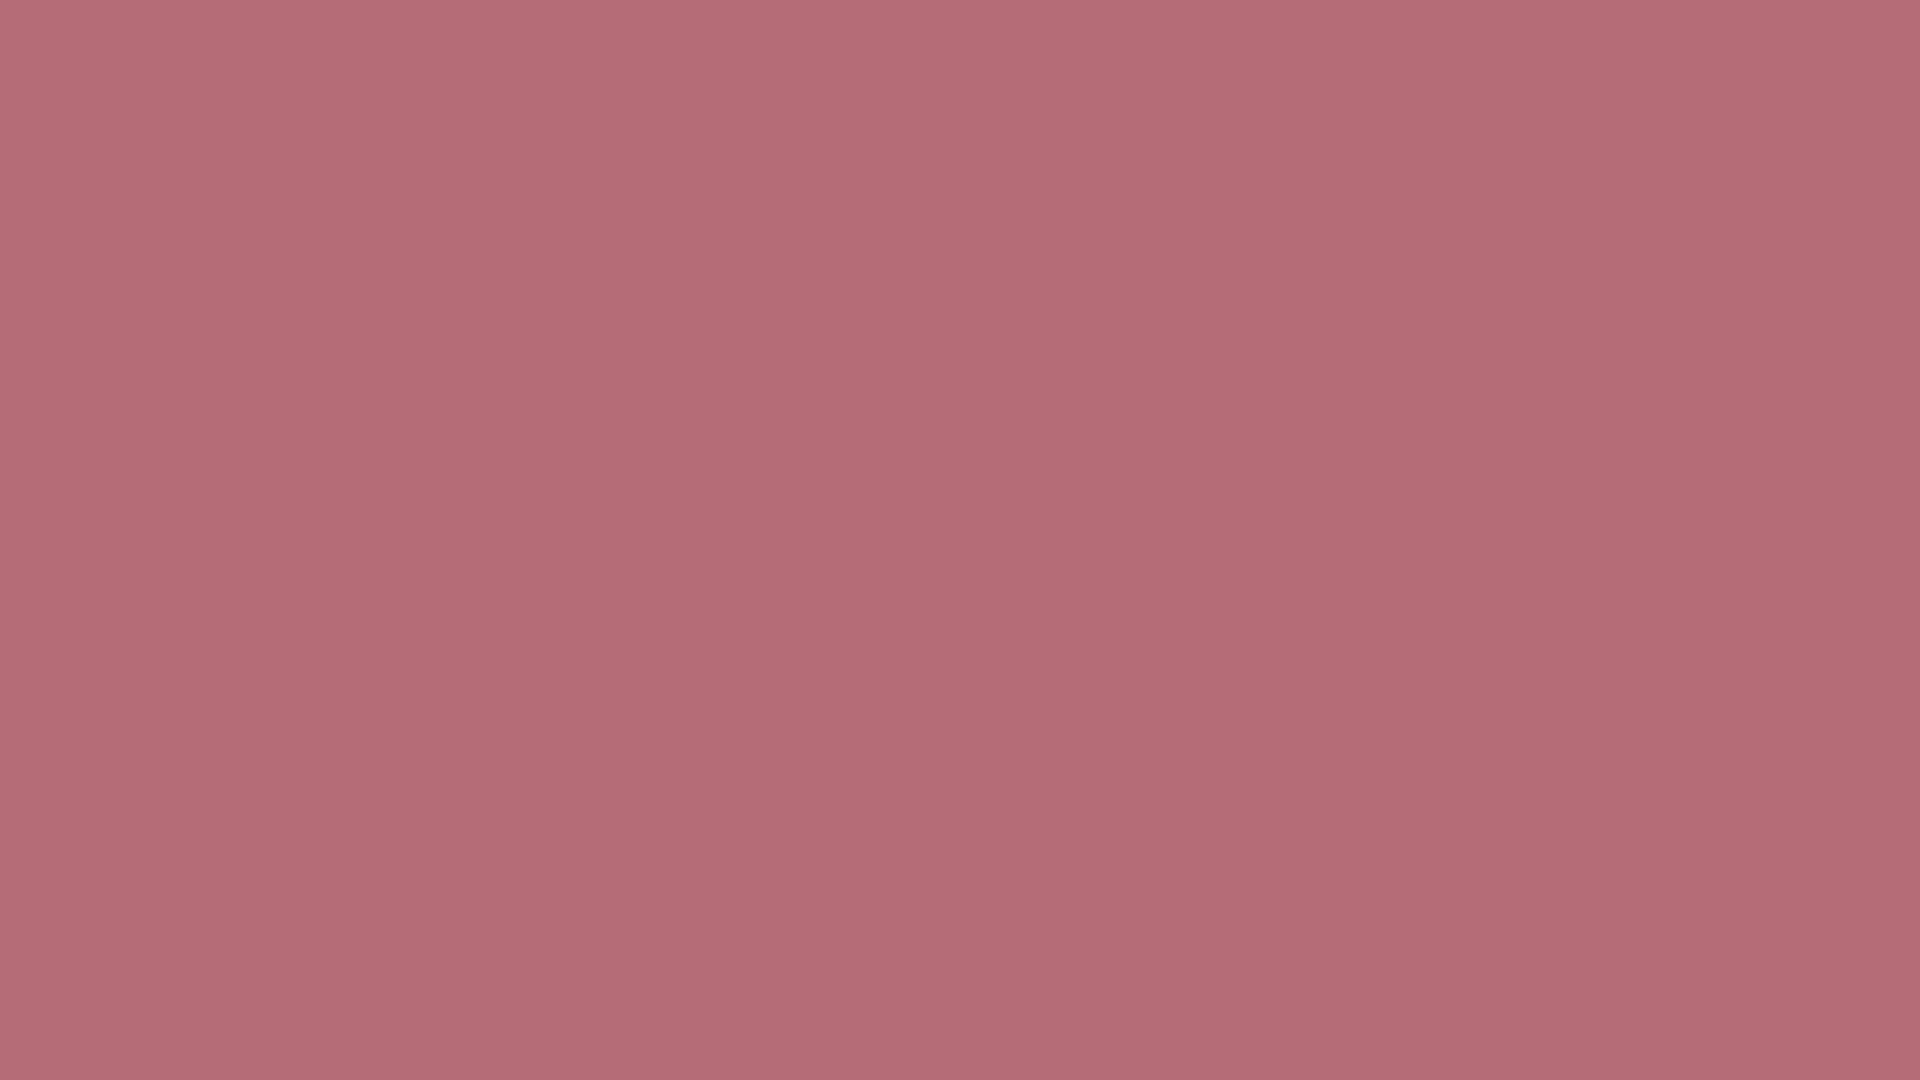 rose gold glitter iphone wallpaper